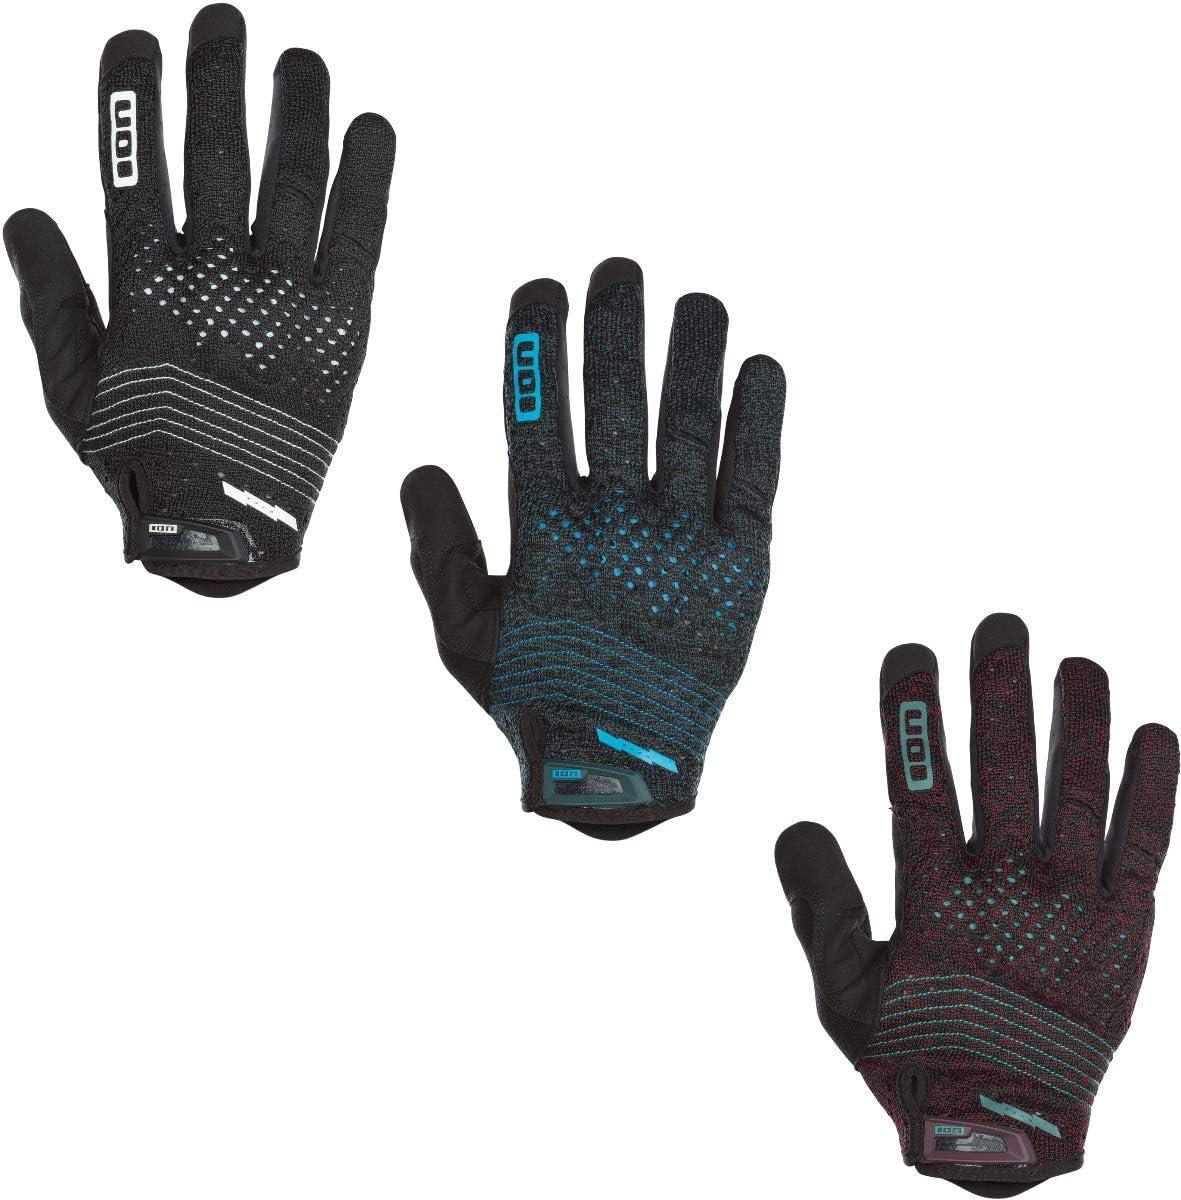 XXS Ion Haze Amp MX DH FR Fahrrad Handschuhe lang schwarz 2018 Gr/ö/ße